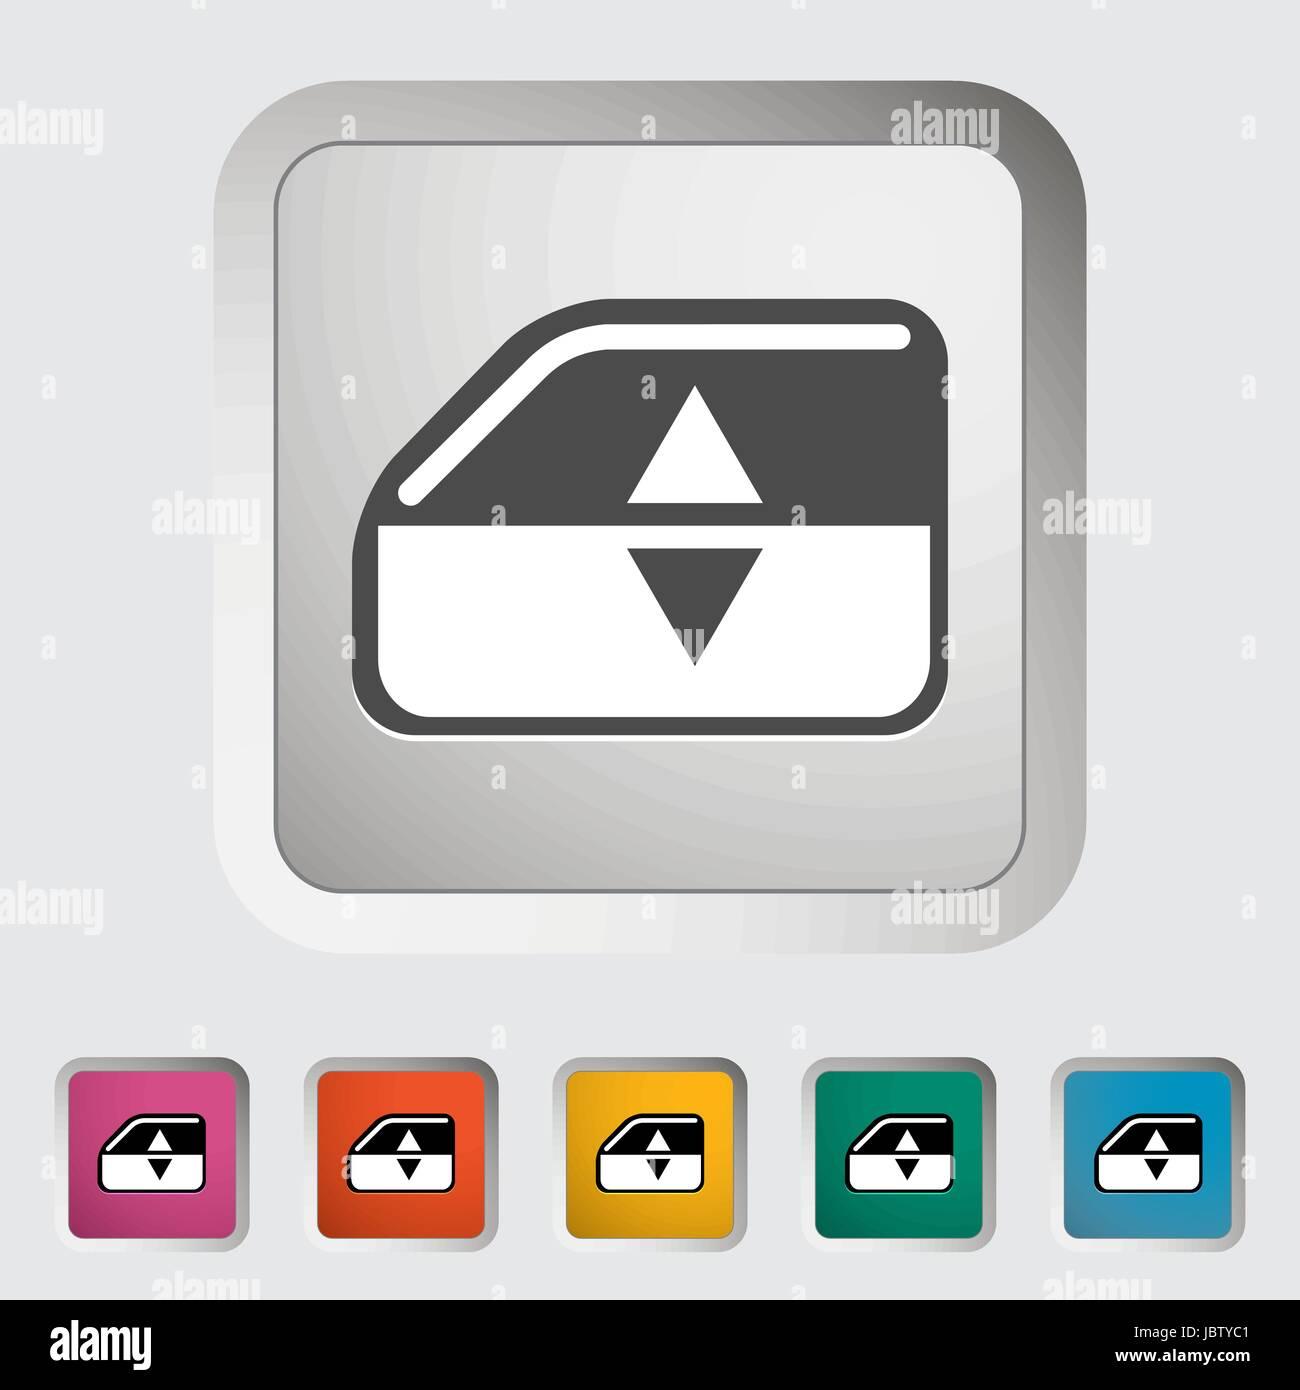 Window lift. Single icon. Vector illustration. - Stock Image